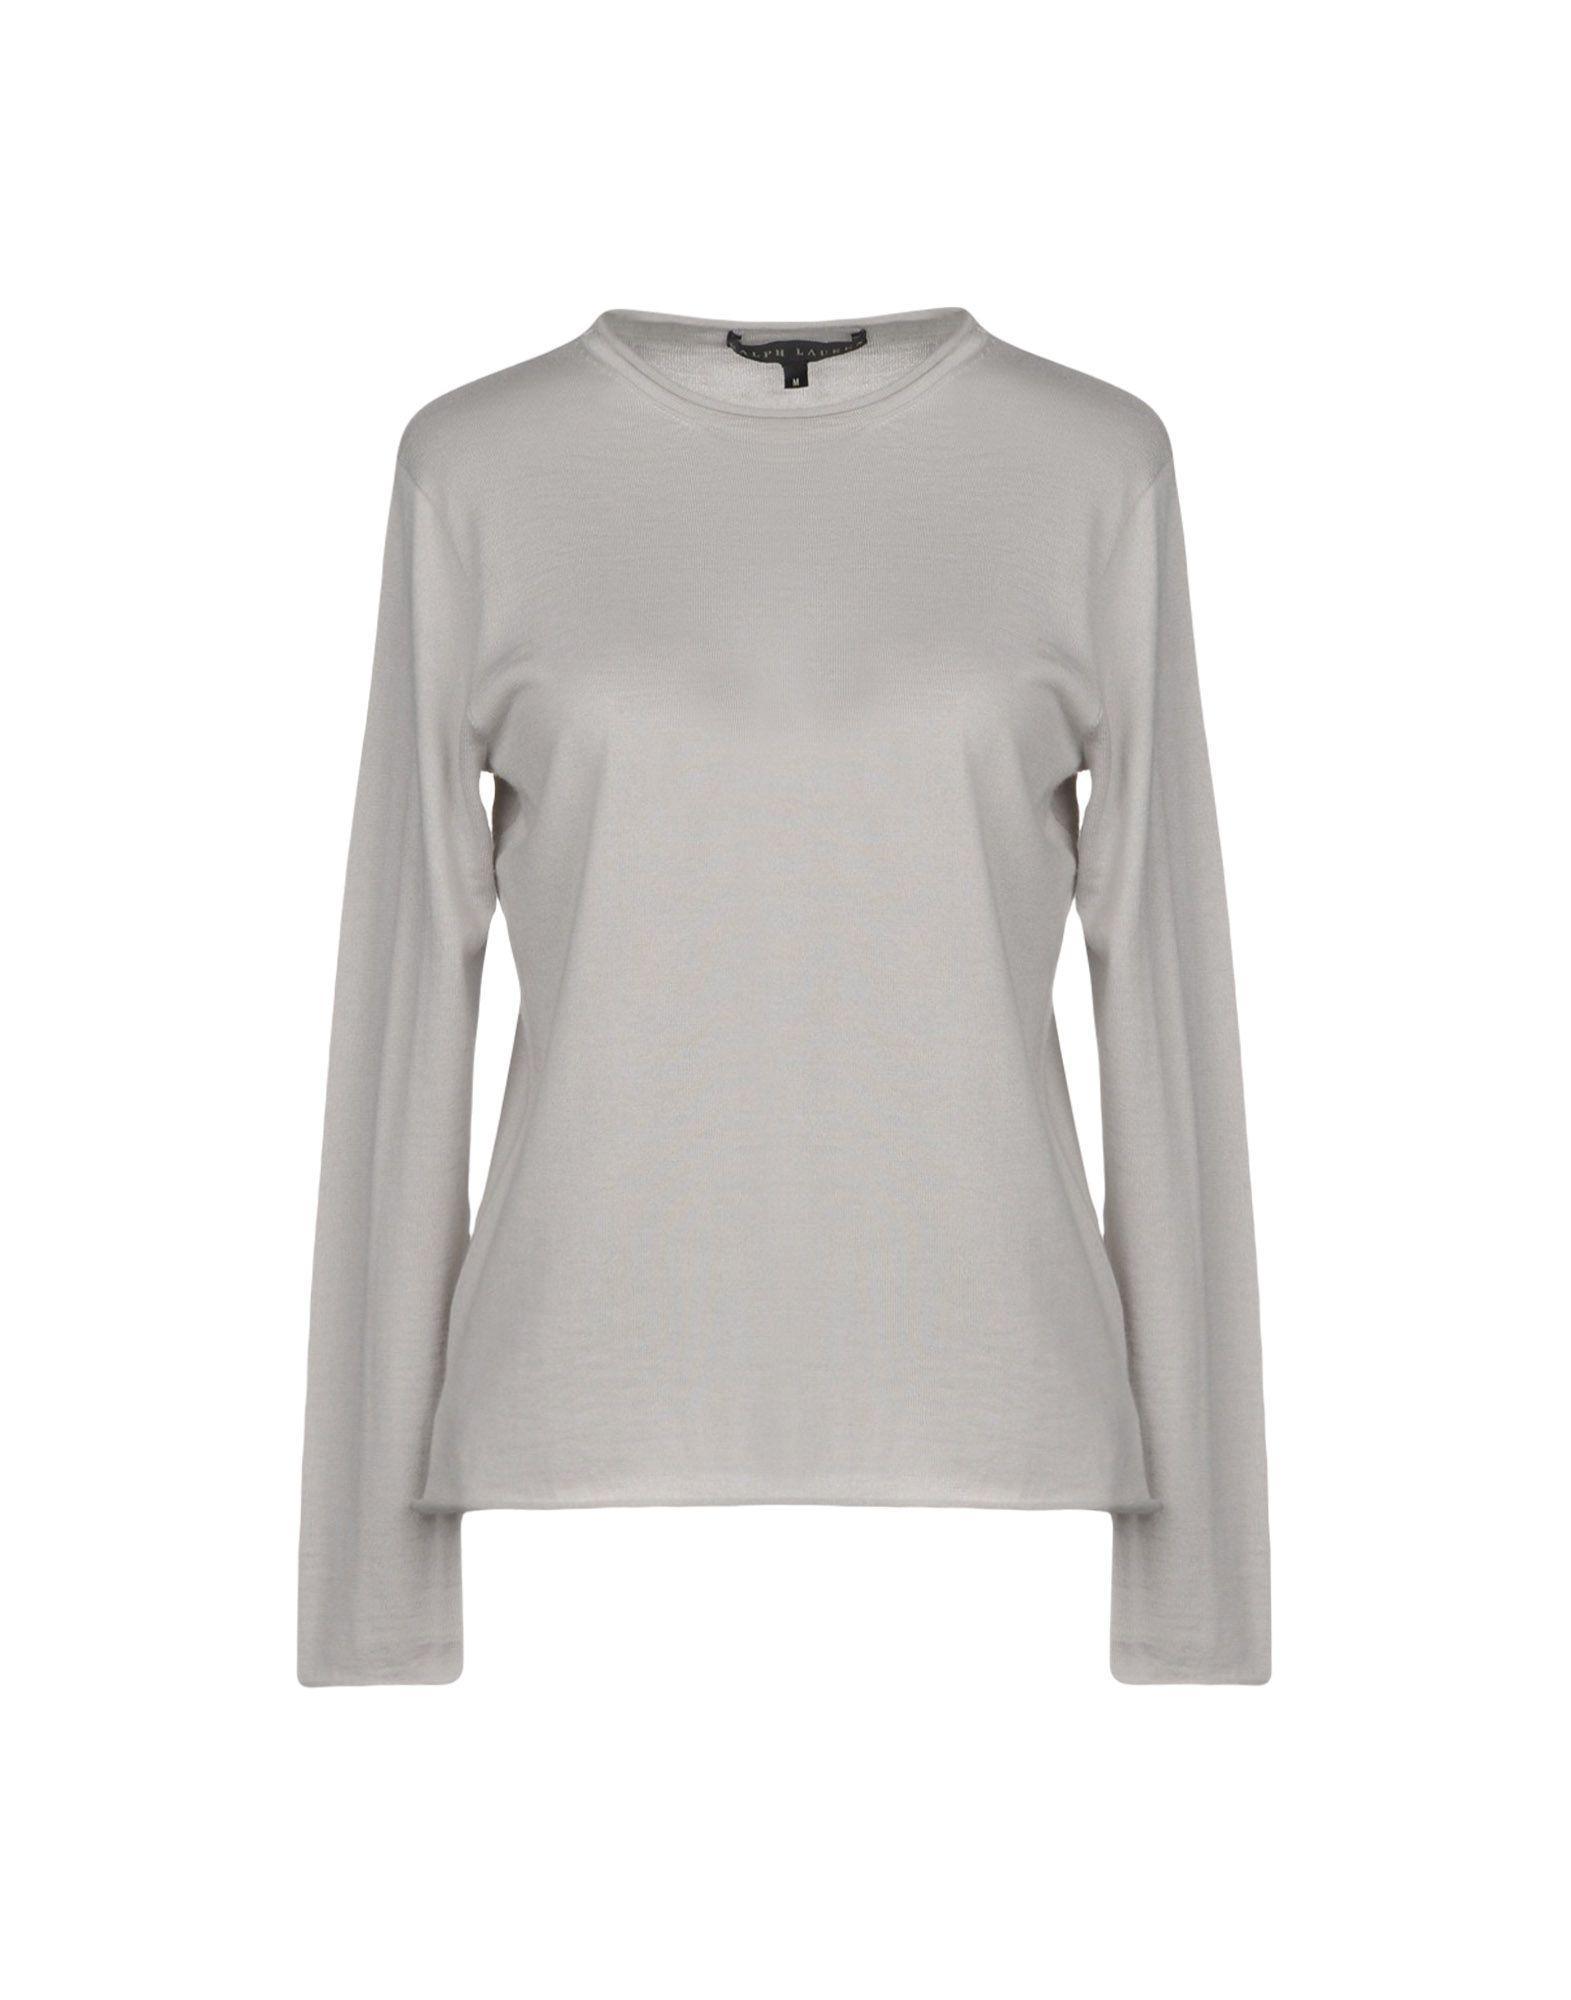 Ralph Lauren Cashmere Blend In Light Grey